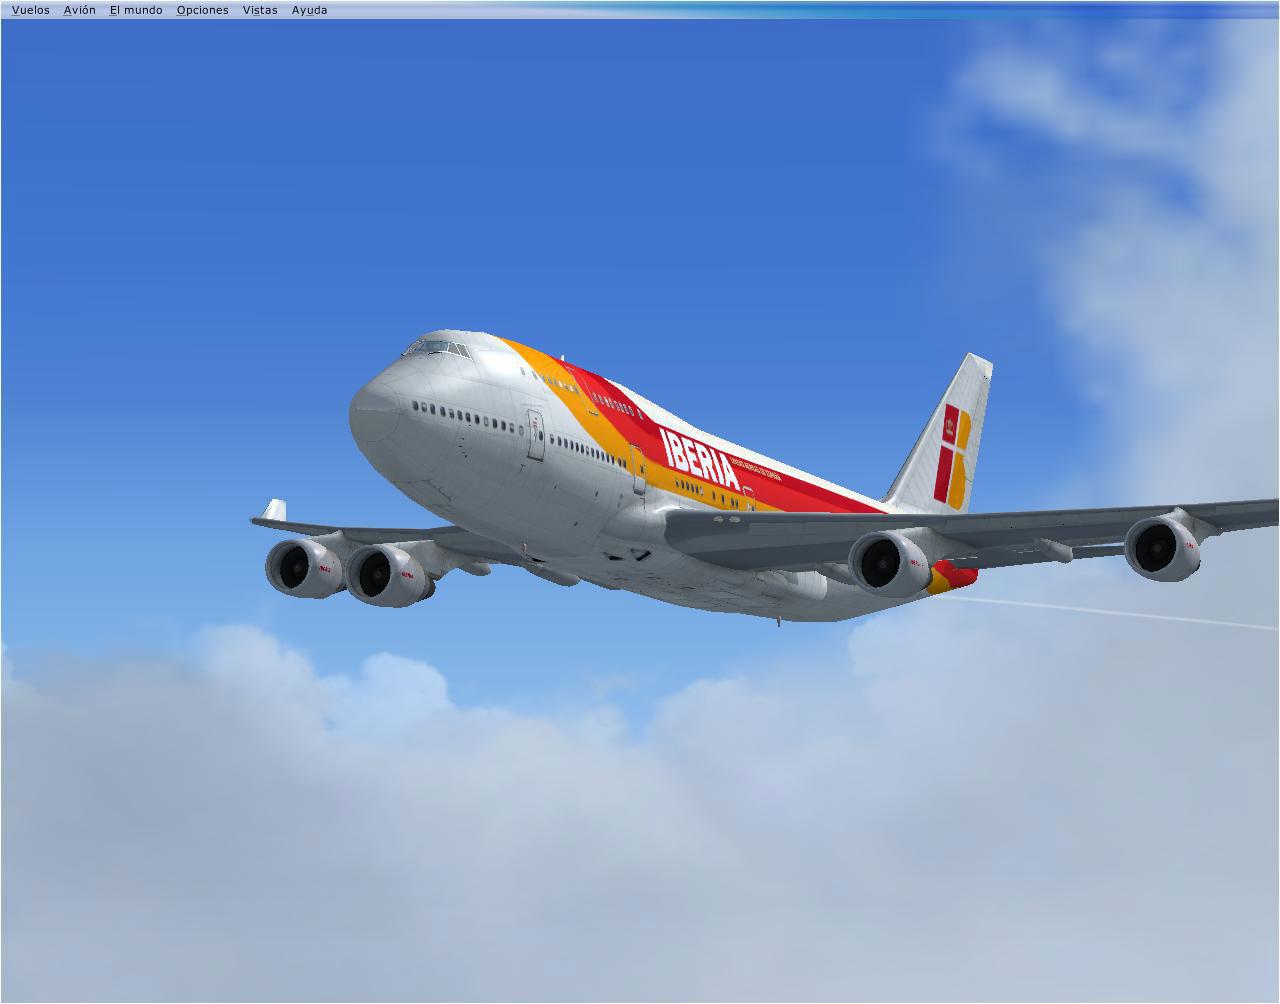 Iberia boeing 747 400 in flight